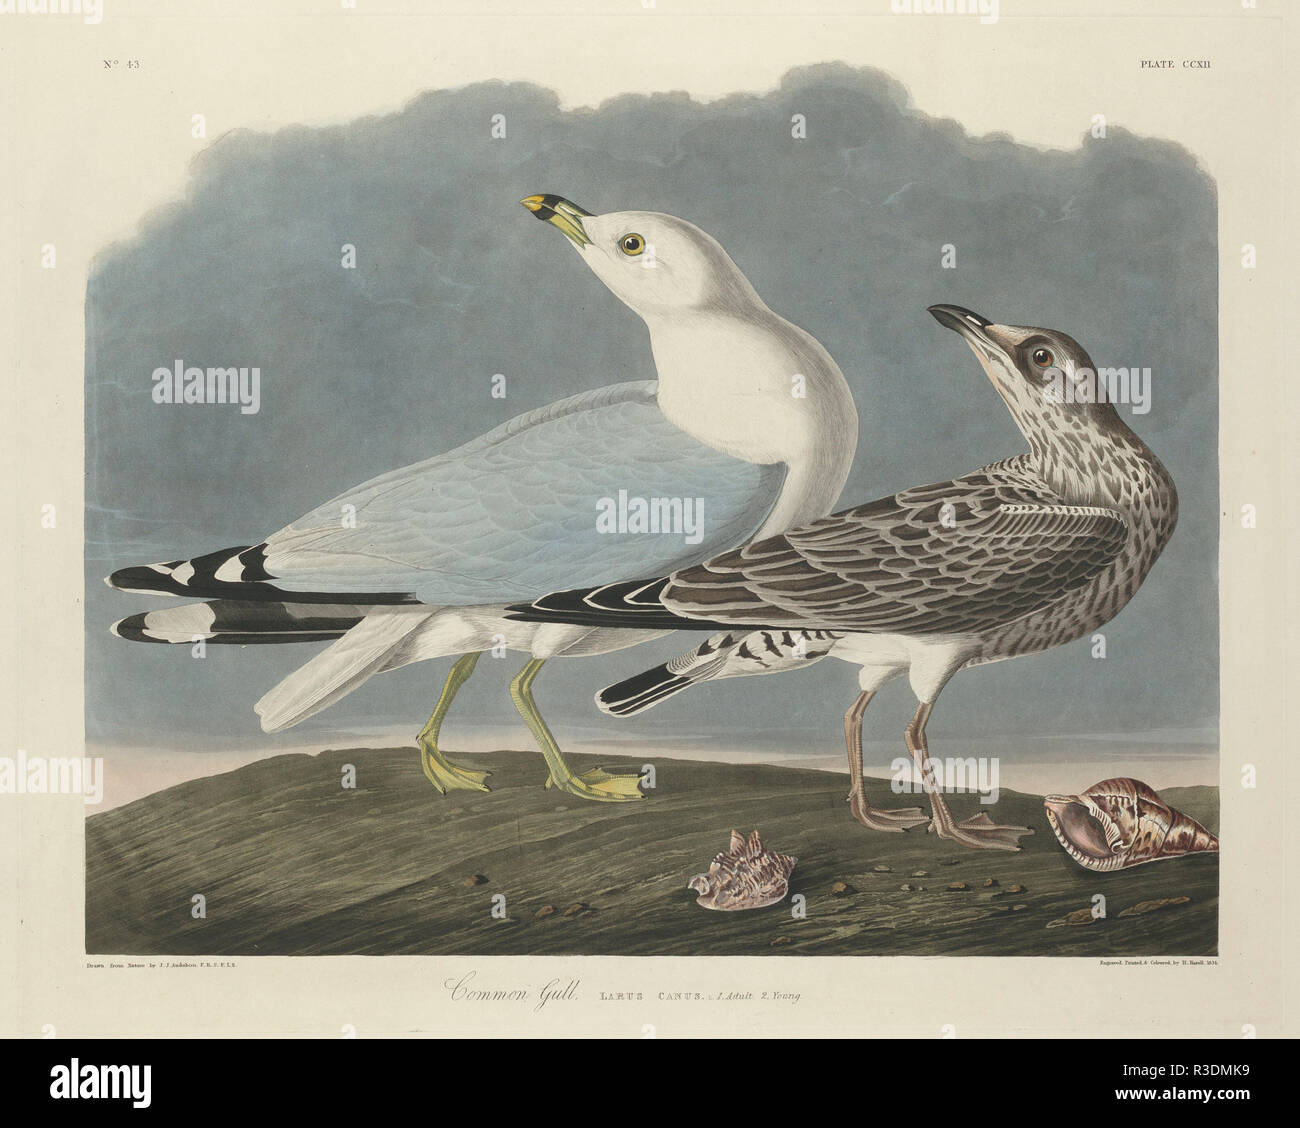 Common Gull. Dated: 1834. Medium: hand-colored etching and aquatint on Whatman paper. Museum: National Gallery of Art, Washington DC. Author: Robert Havell after John James Audubon. AUDUBON, JOHN JAMES. - Stock Image